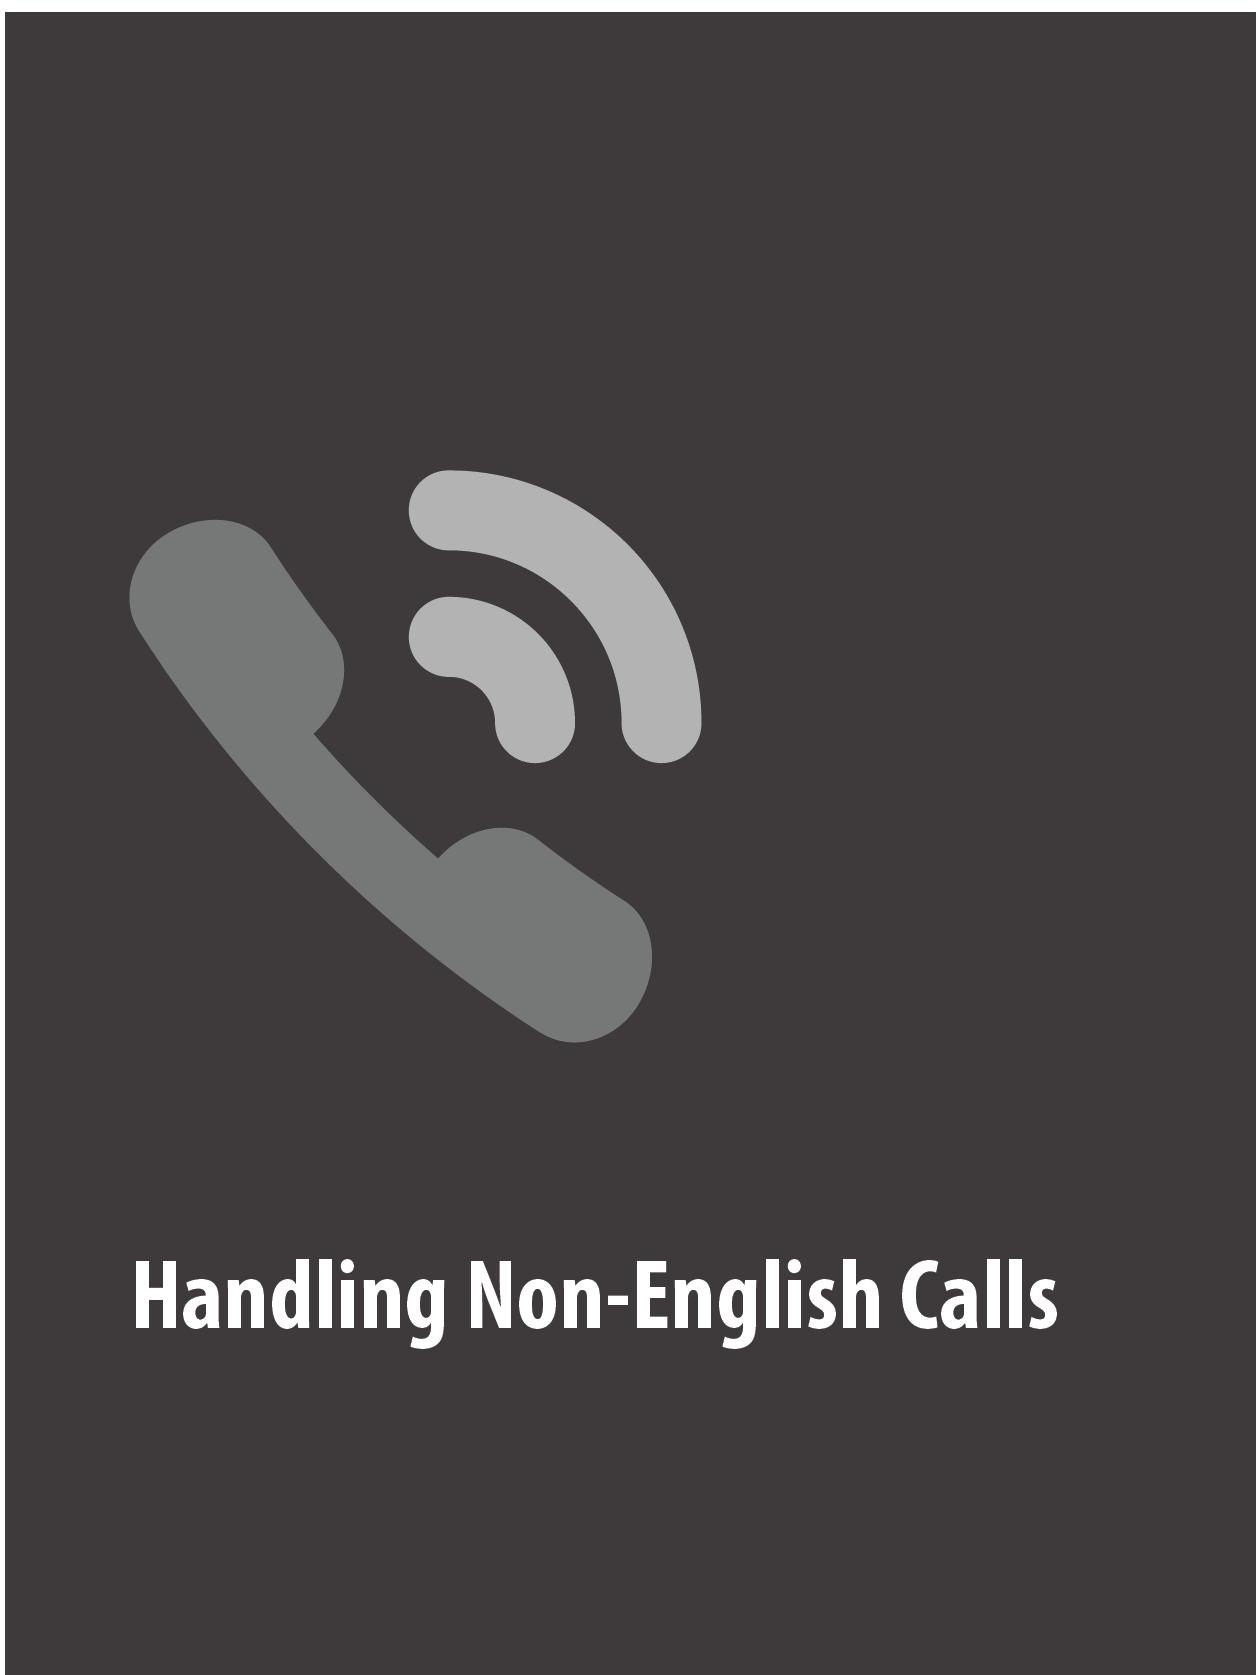 Handling-Non-English-Calls - Cover.png